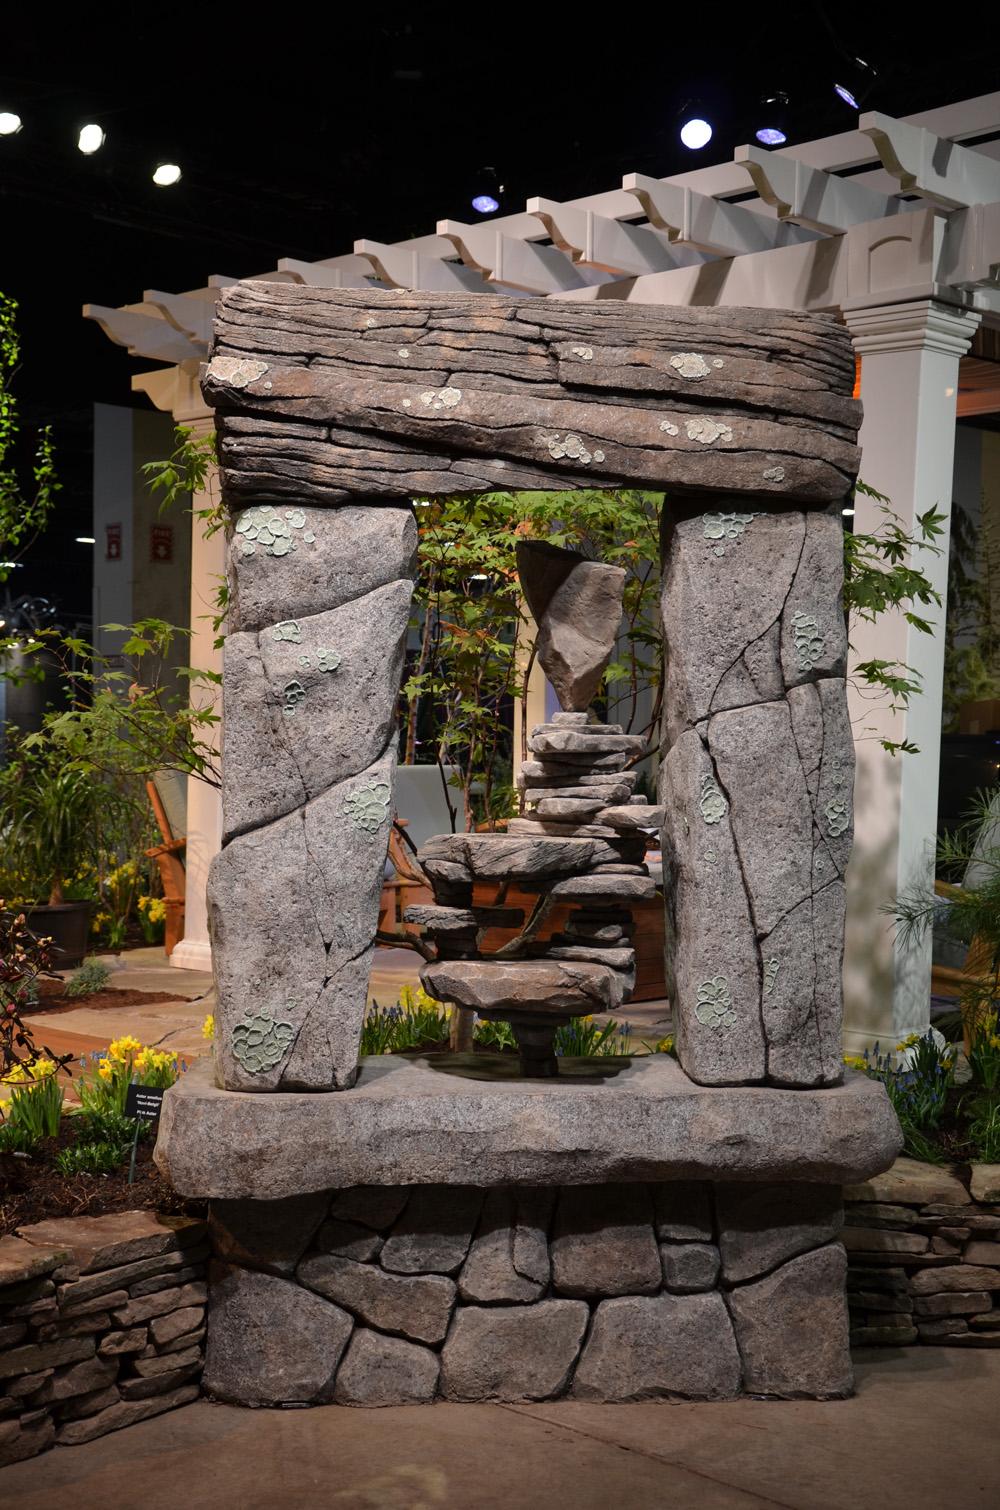 Boston Flower Show_Rock Sculpture